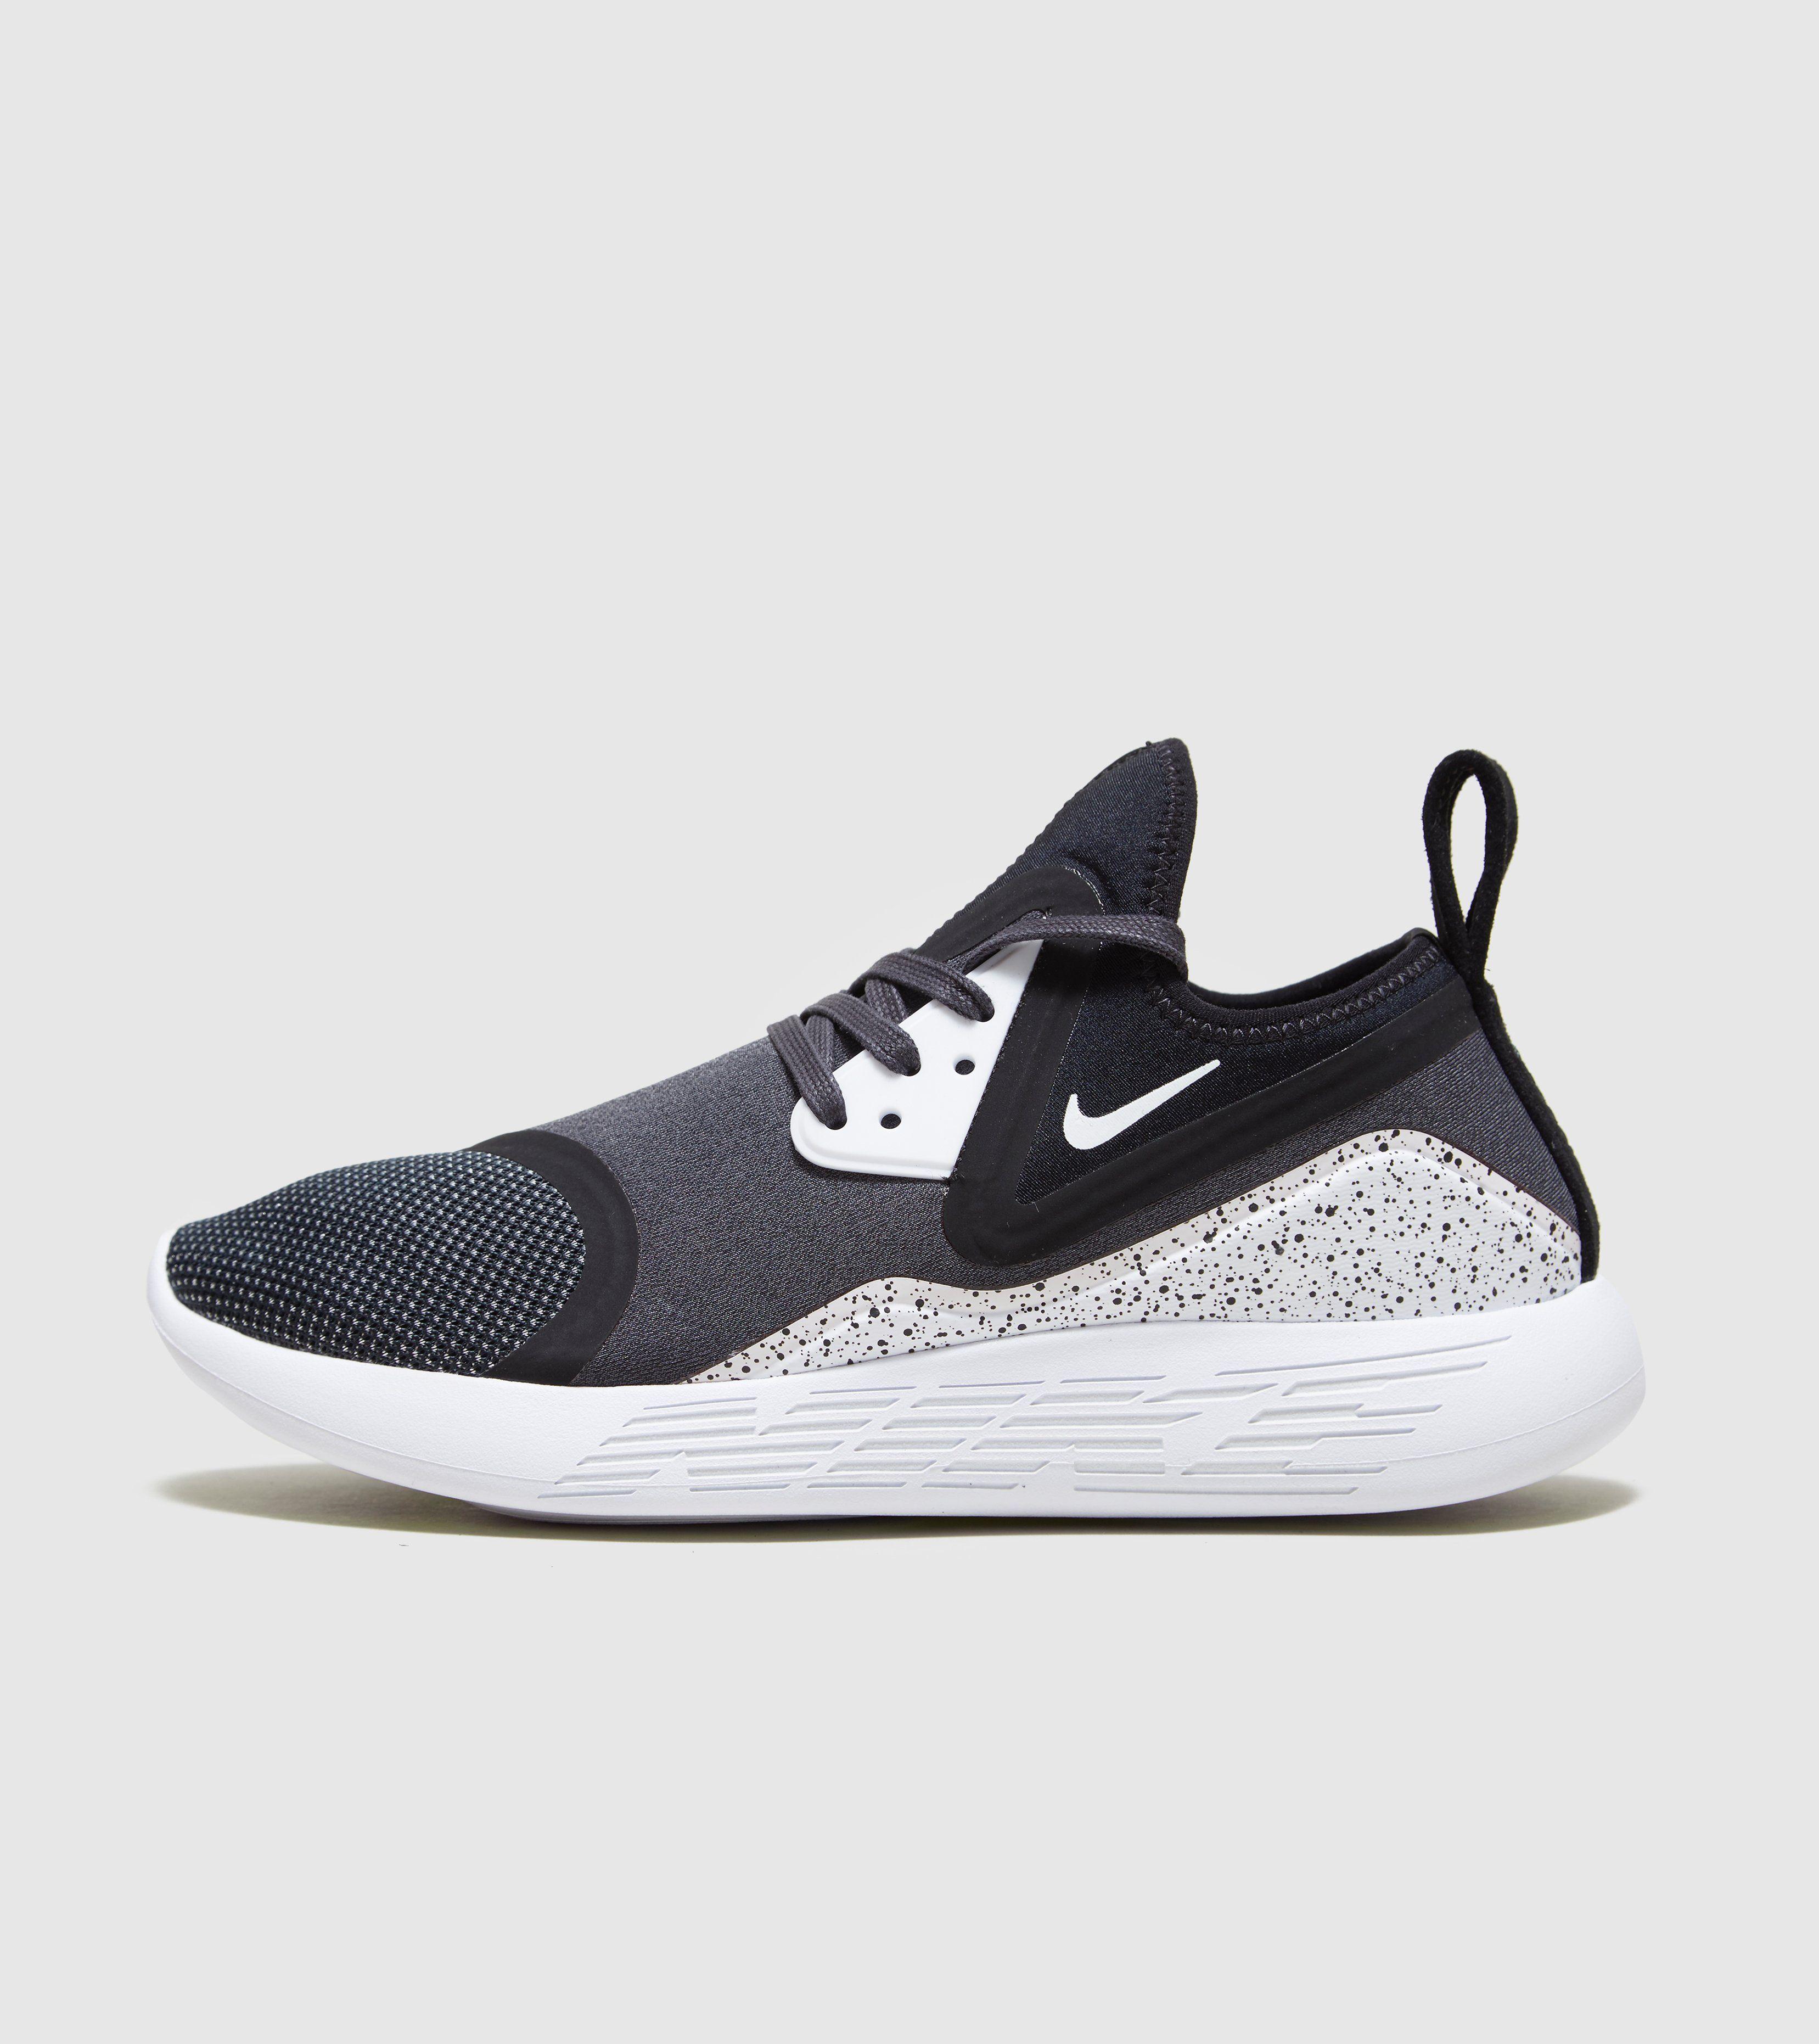 0a07c31fd93 Nike Lunarcharge Essential